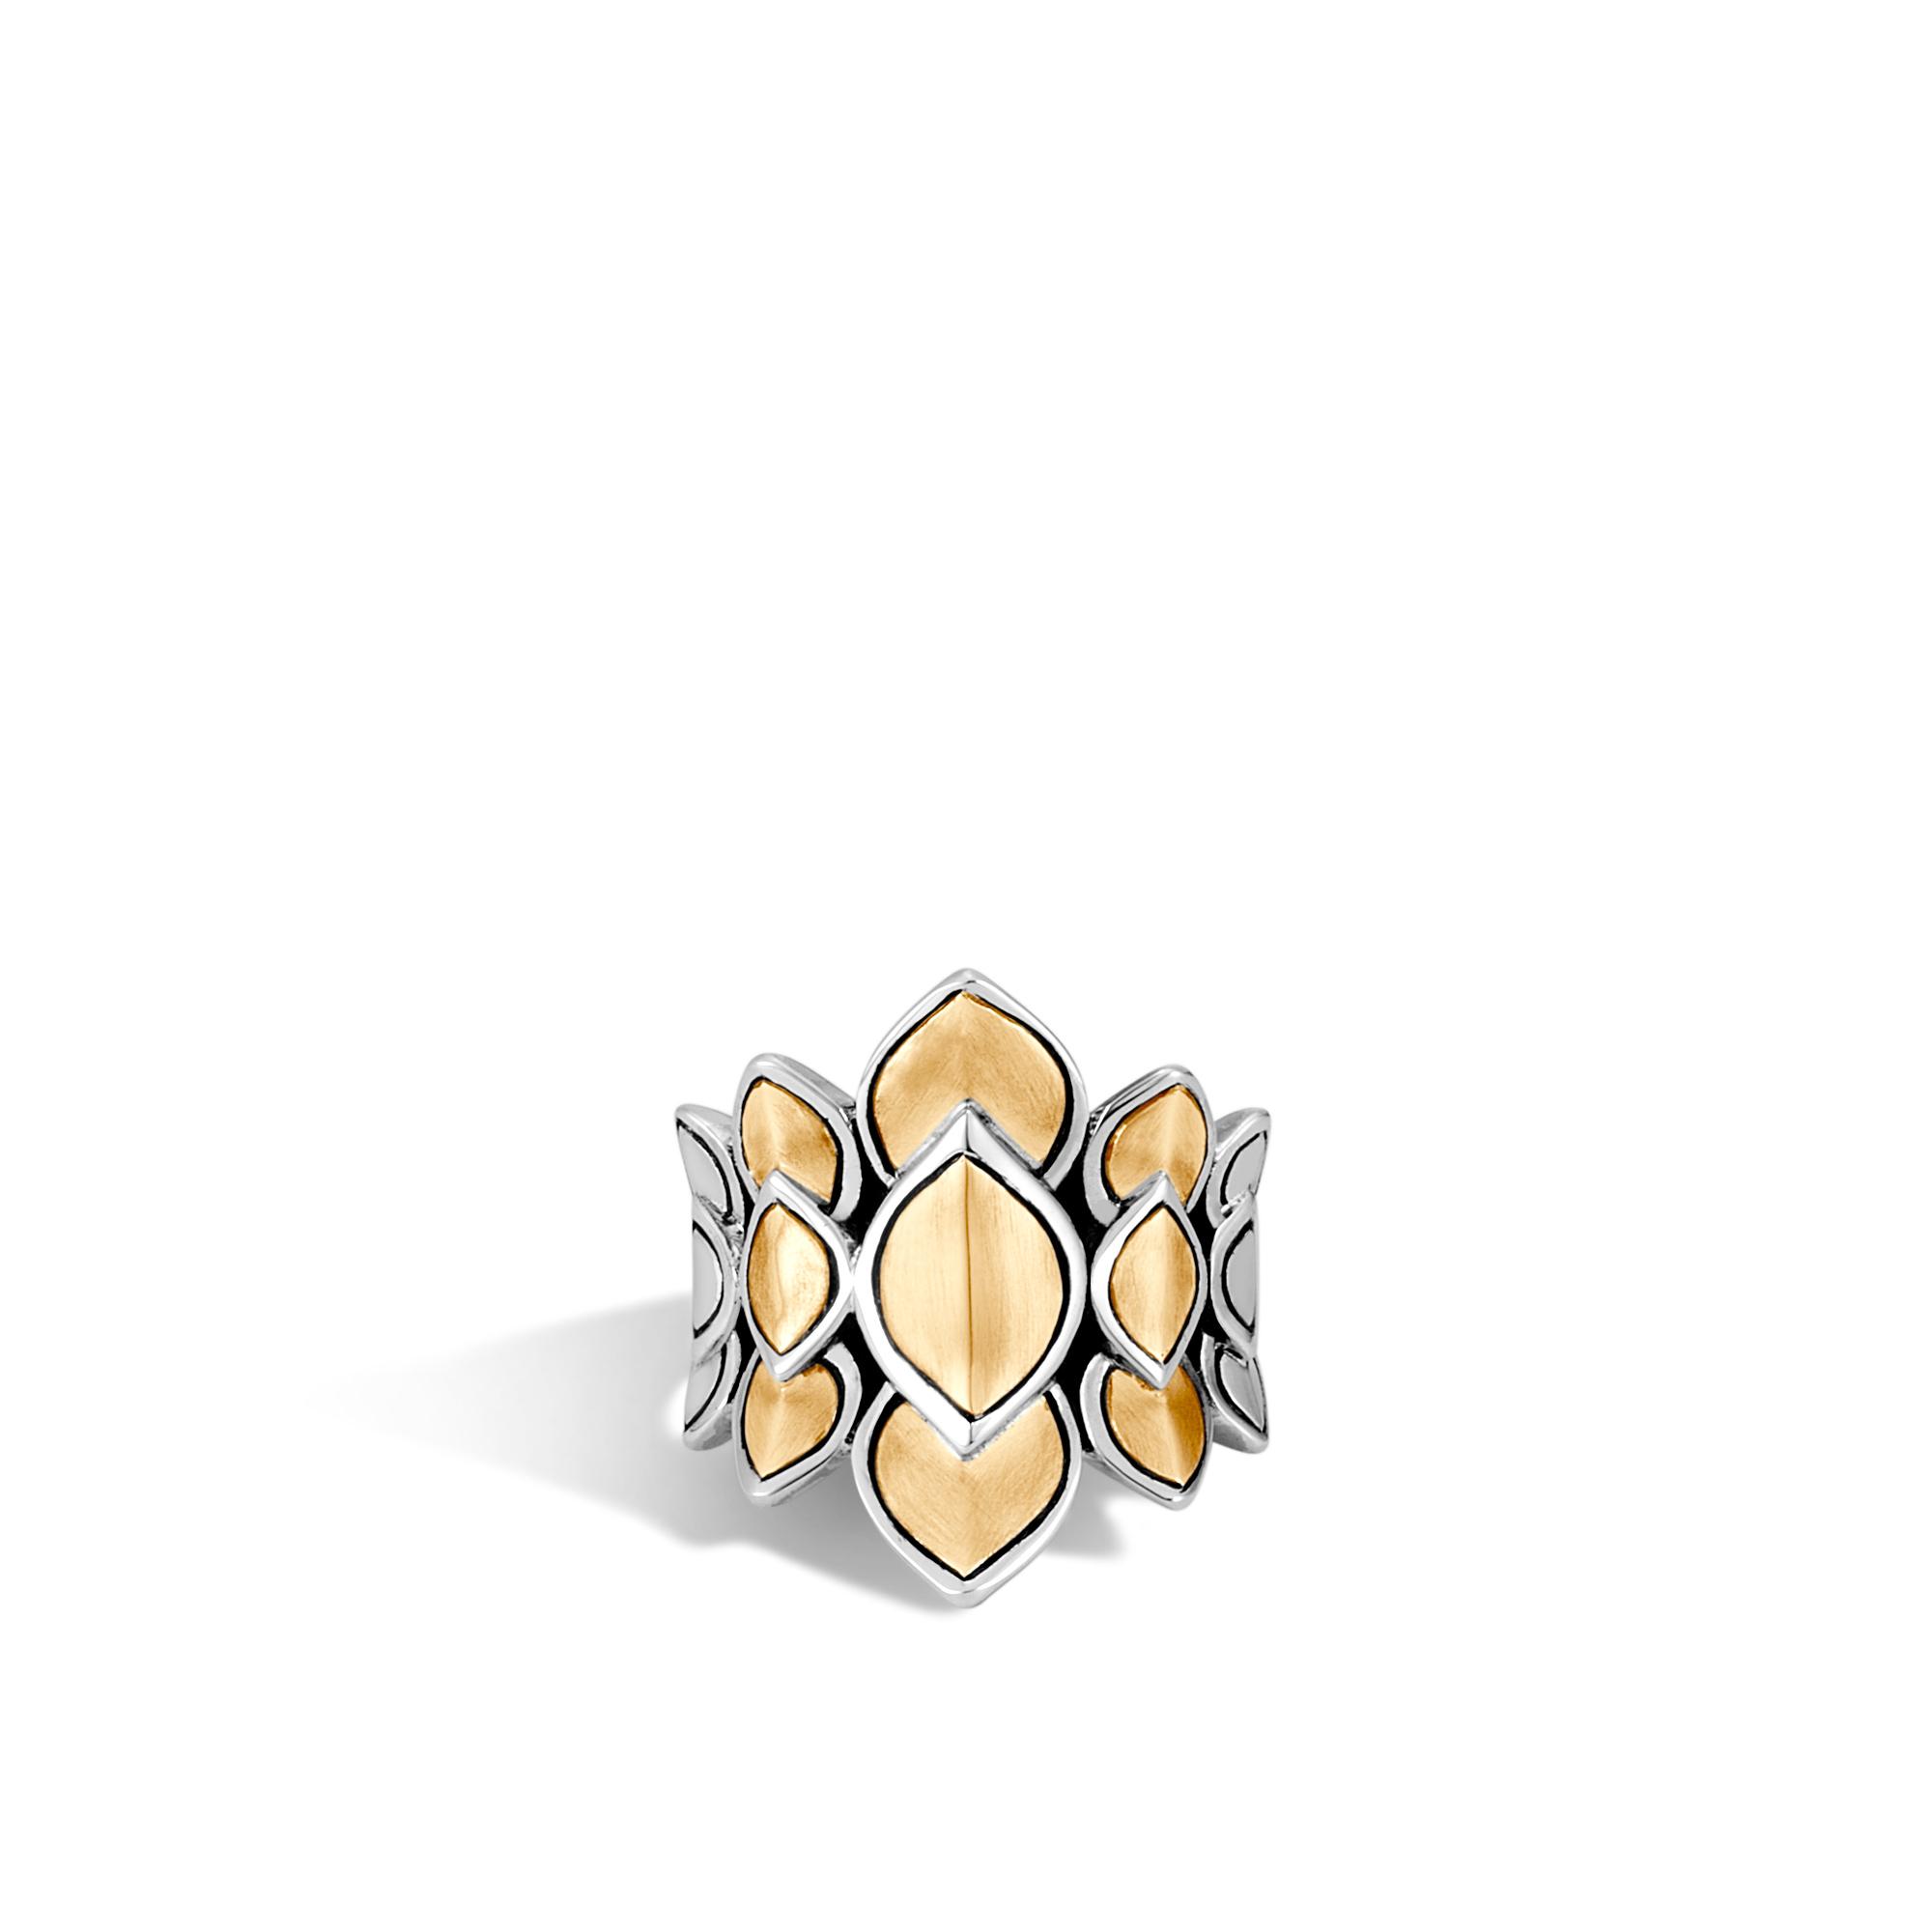 Legends Naga Saddle Ring in Silver and Brushed 18K Gold, , large